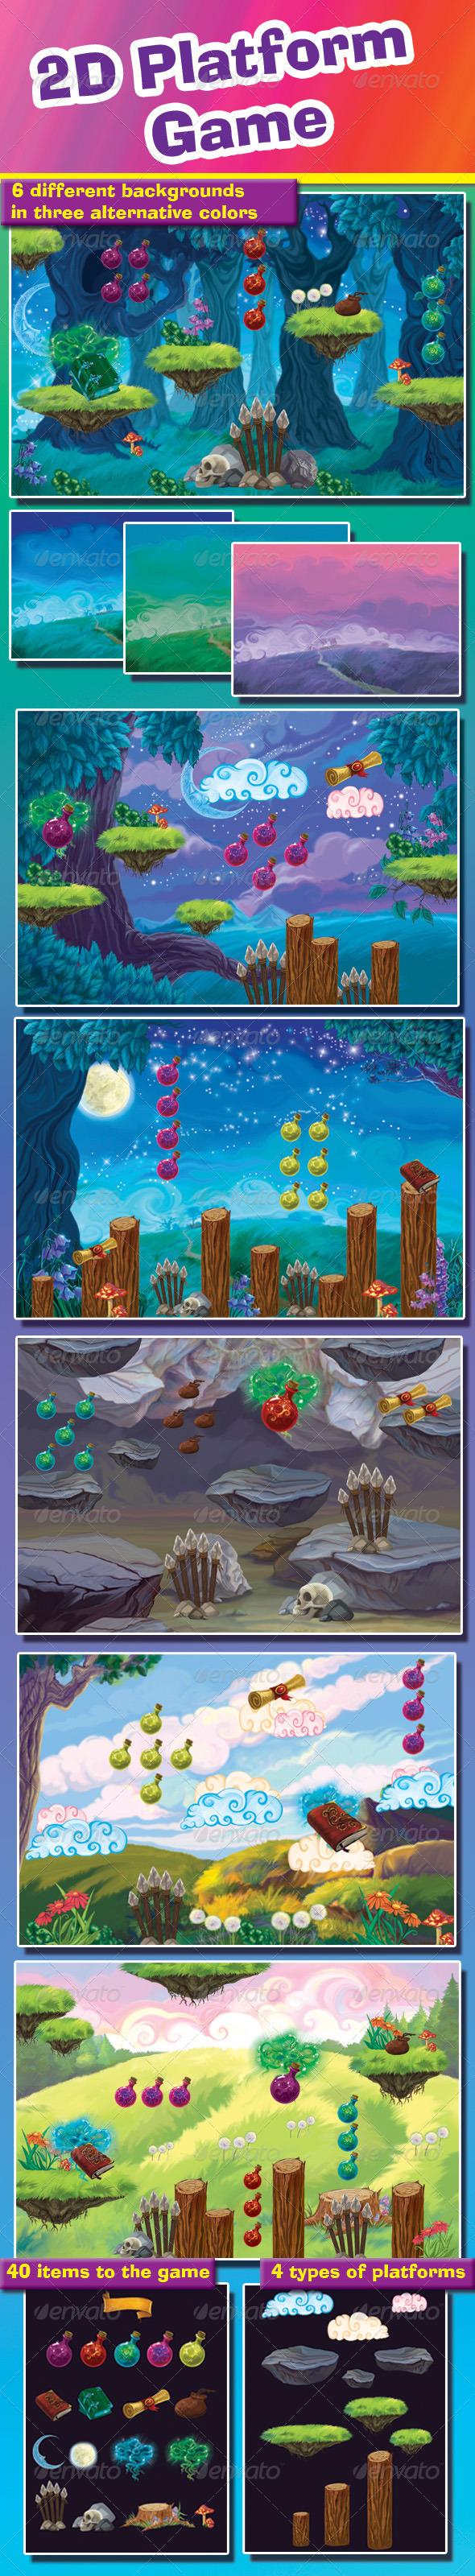 GraphicRiver 2D Platform Game 7889229